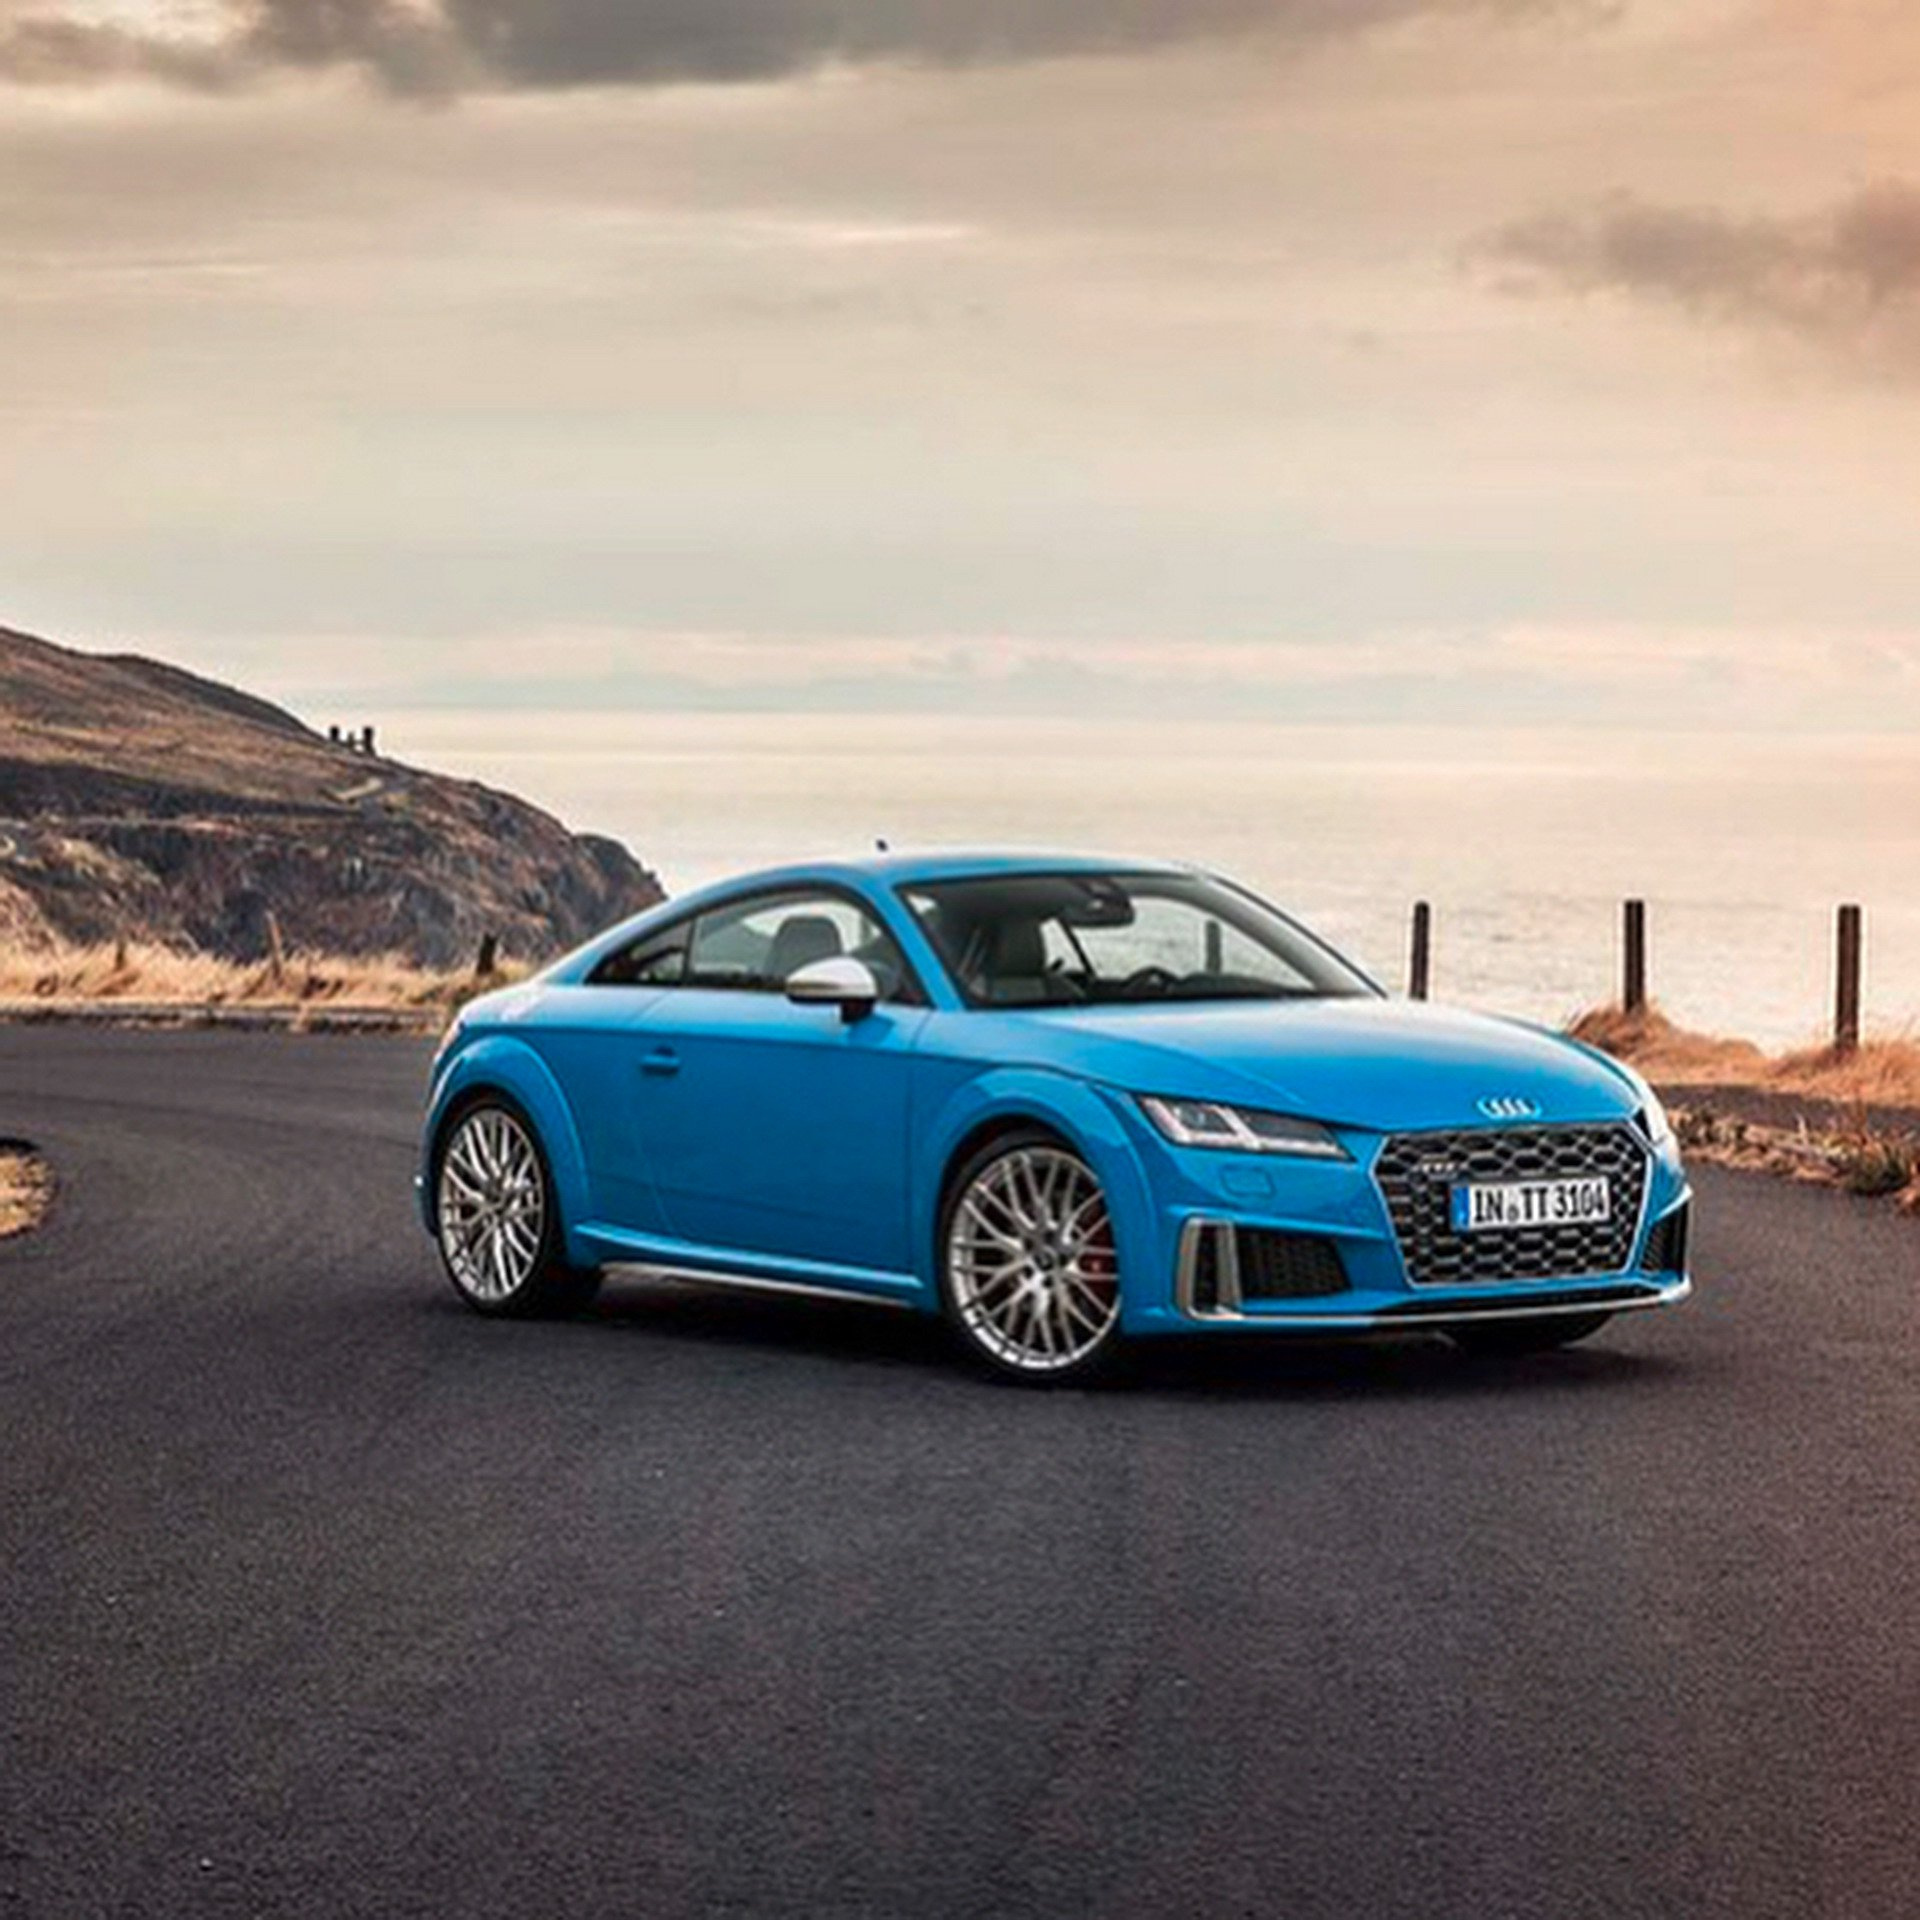 2019 Audi TT Facelift Leaked: TTS Loses 4 HP, TT RS Looks